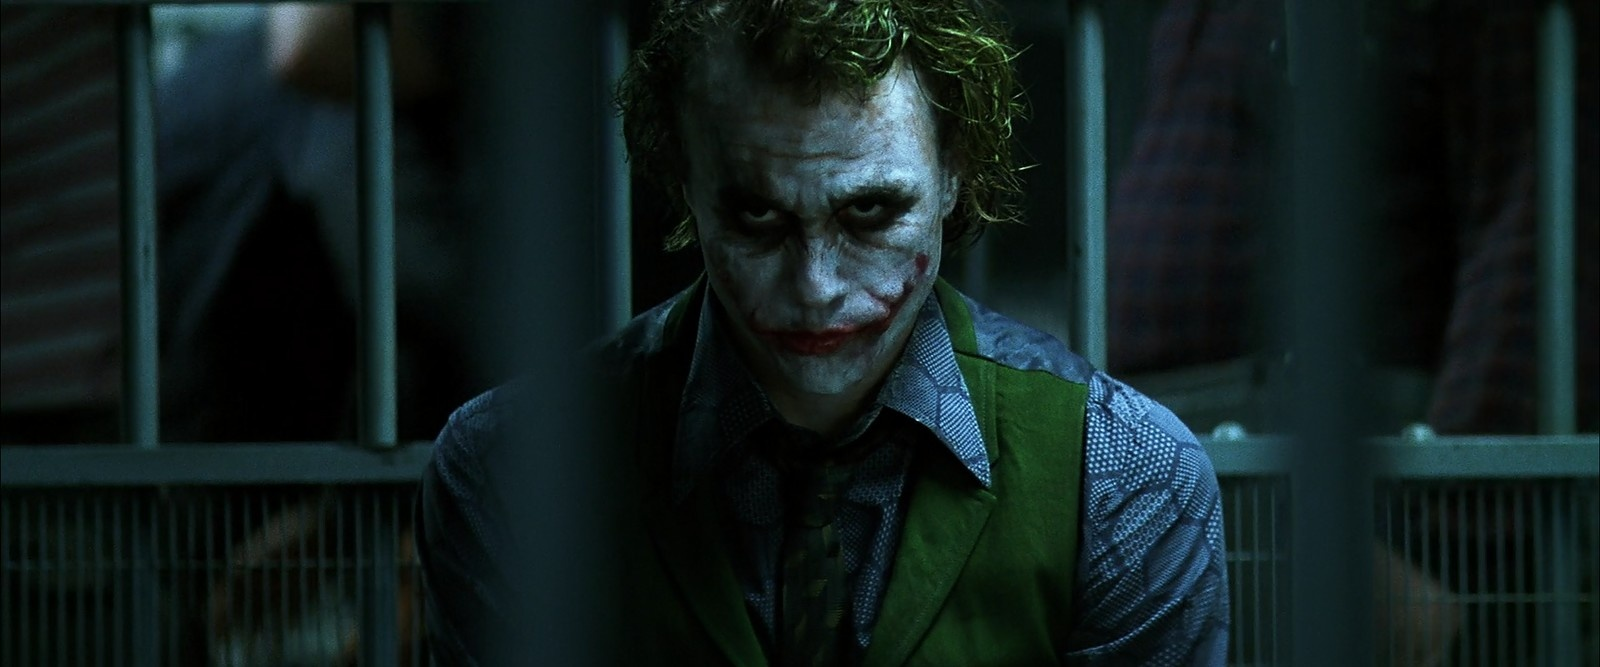 Galerie The Dark Knight : Le Chevalier noir 8